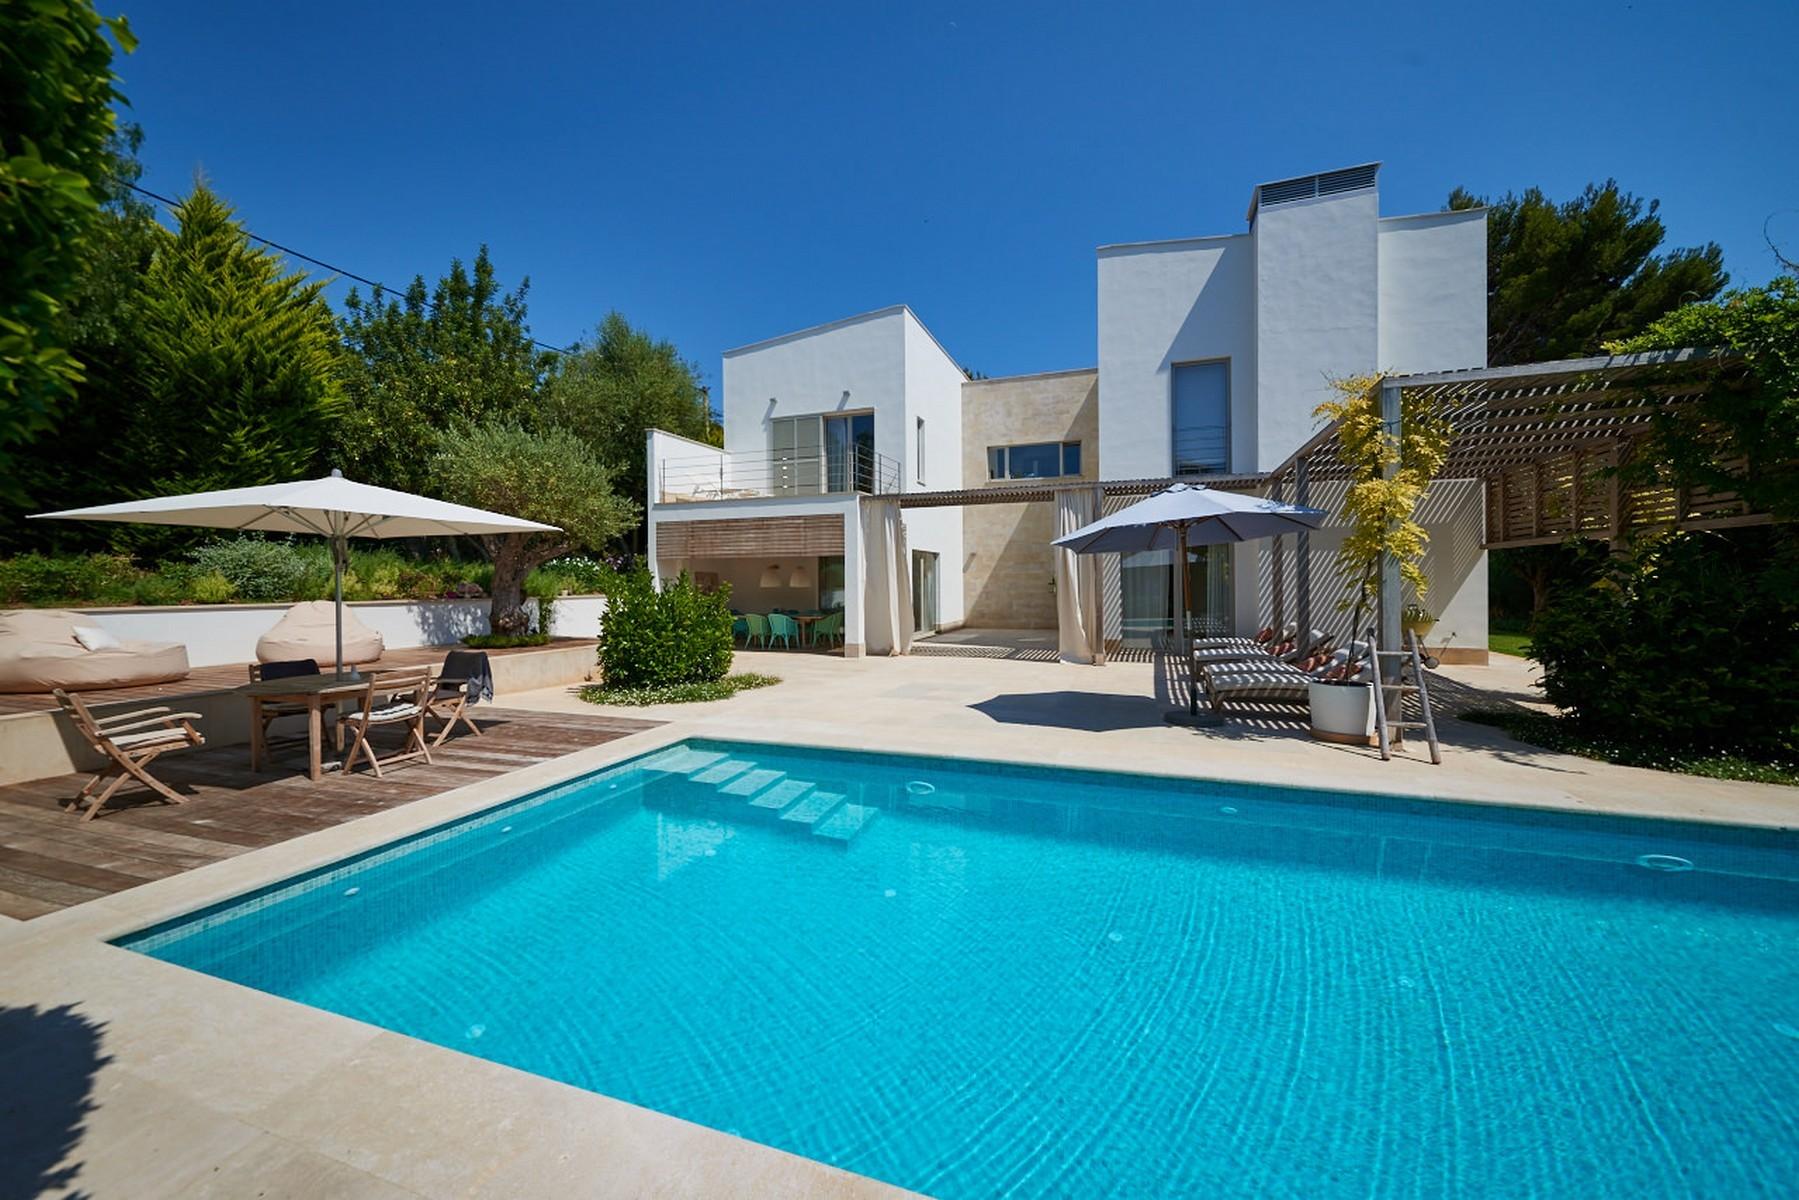 Single Family Home for Sale at Modern villa near to the beach in Bendinat Bendinat, Mallorca 07181 Spain